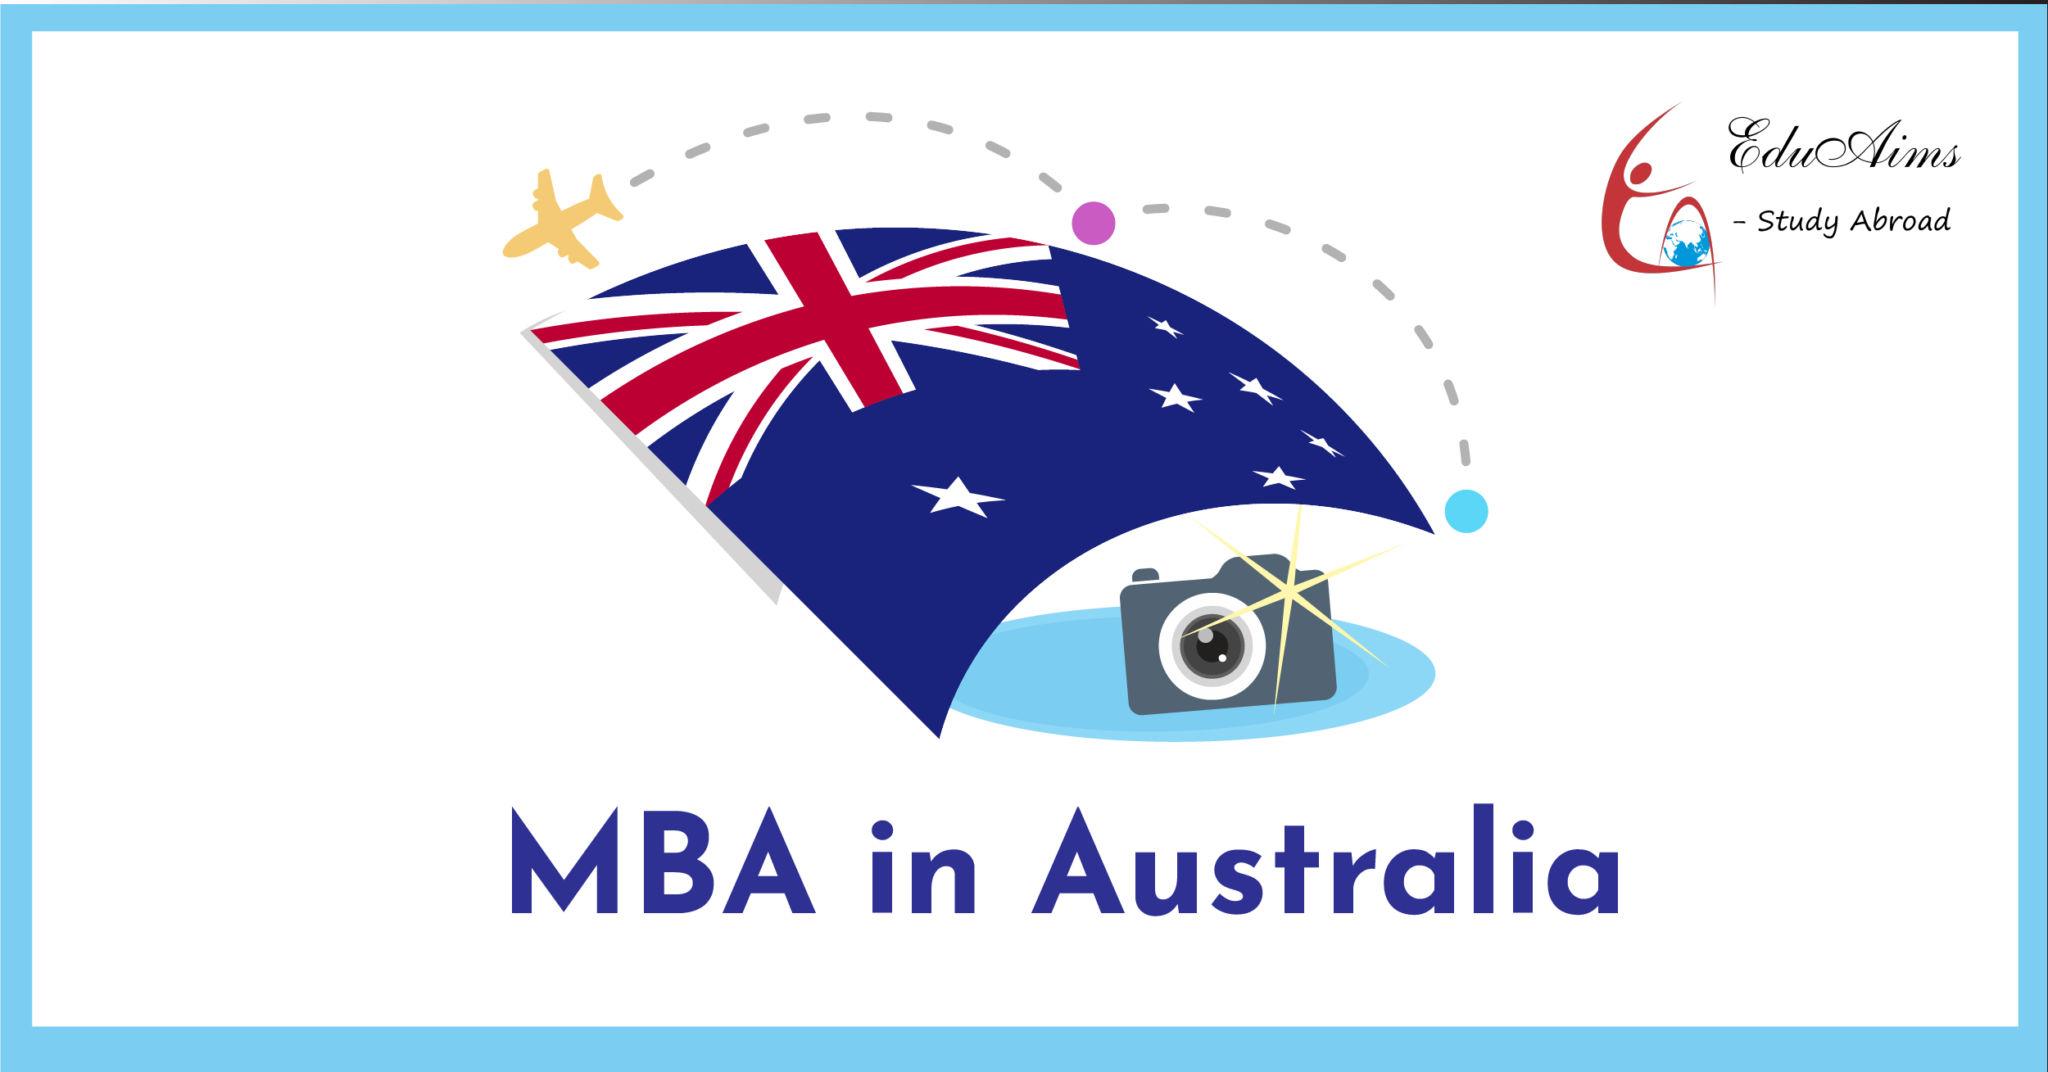 Logo Cover 16to30 03 EduAims MBA in Australia